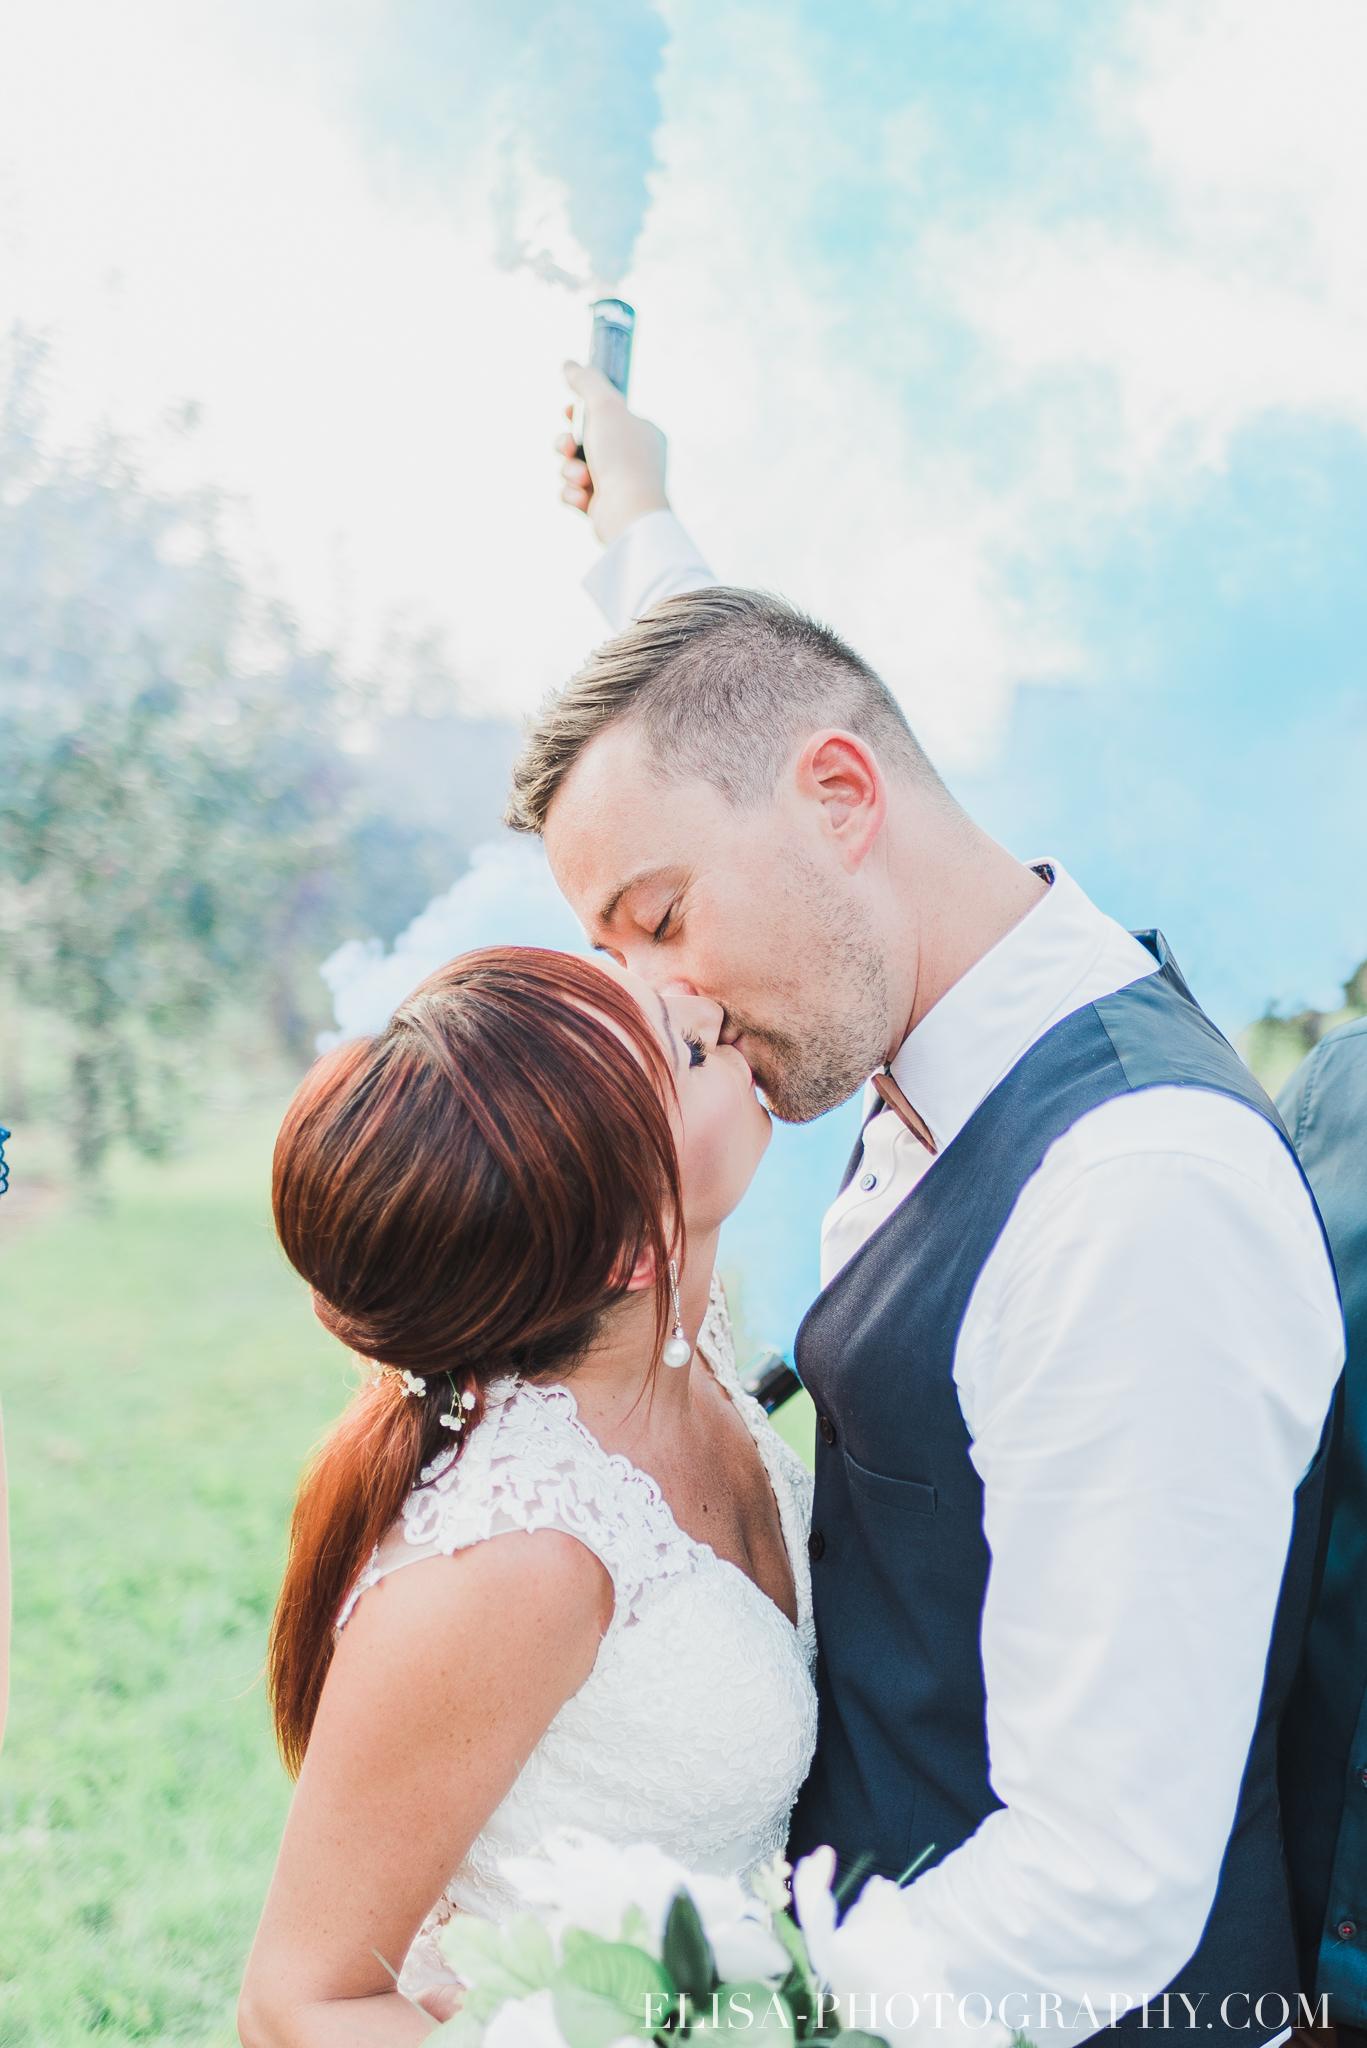 wedding Smoke bomb et mariage